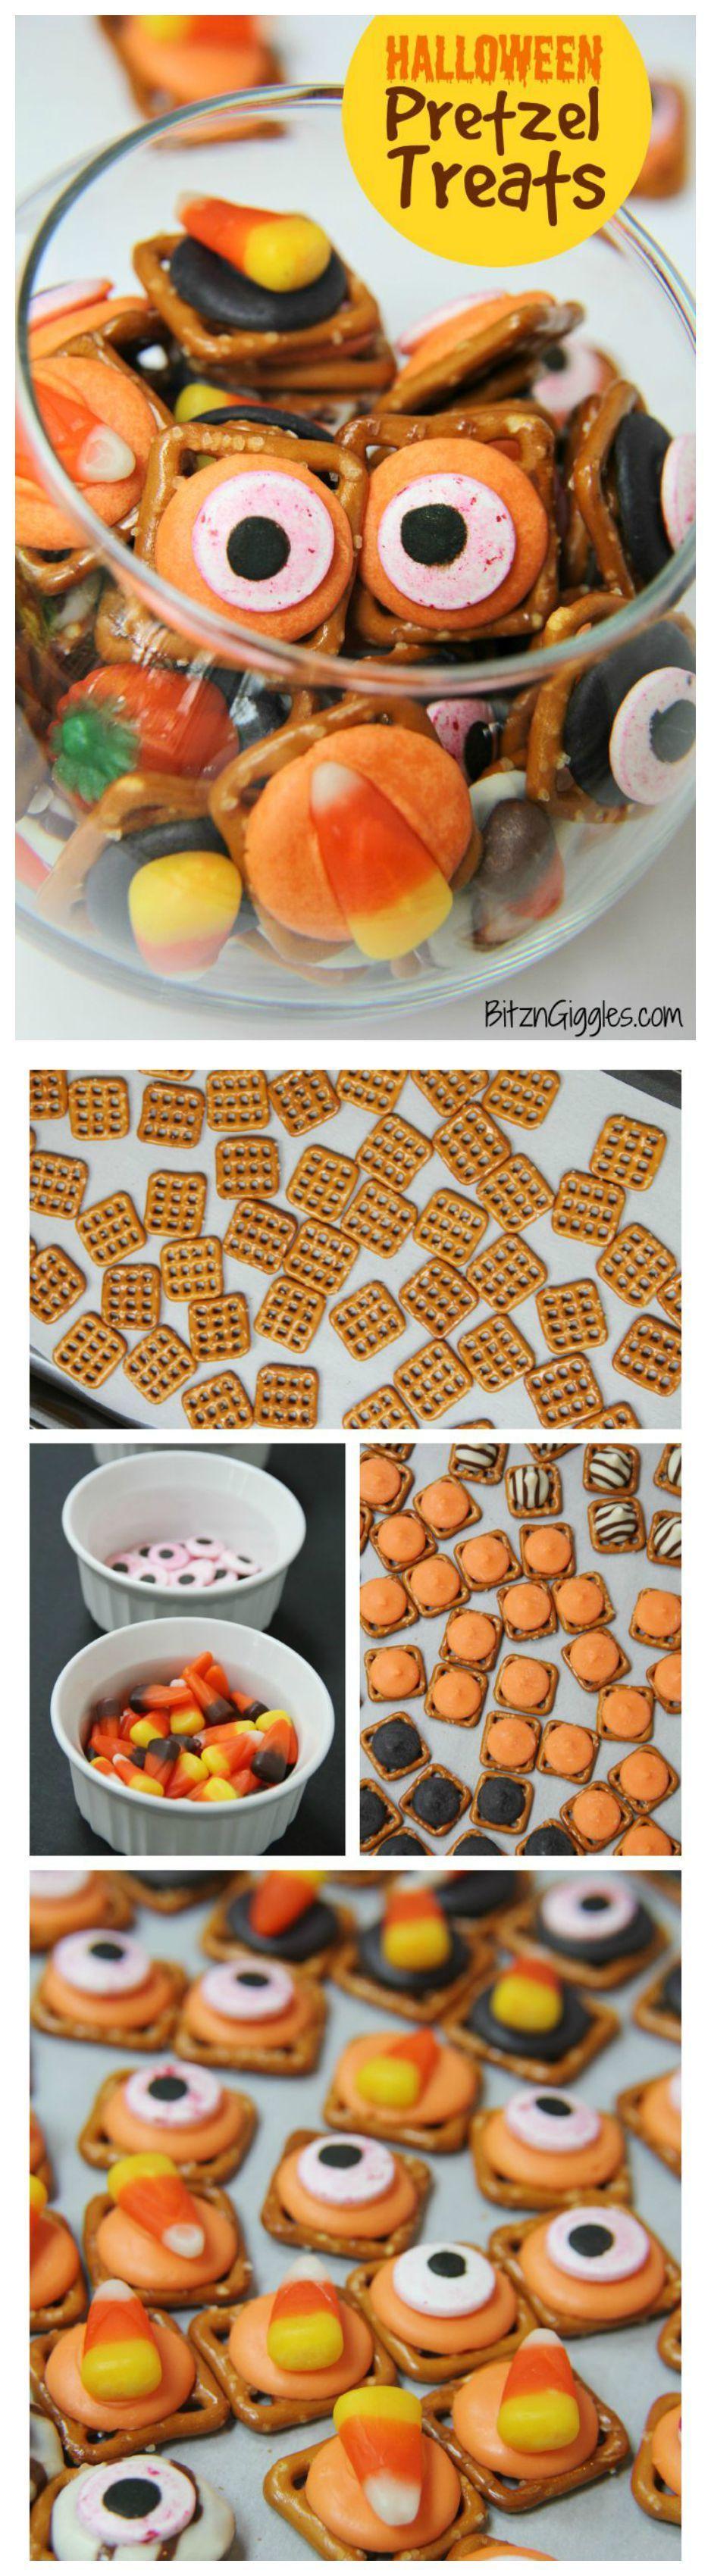 Utz Halloween Pretzels Nutrition Information  Halloween Pretzel Treats